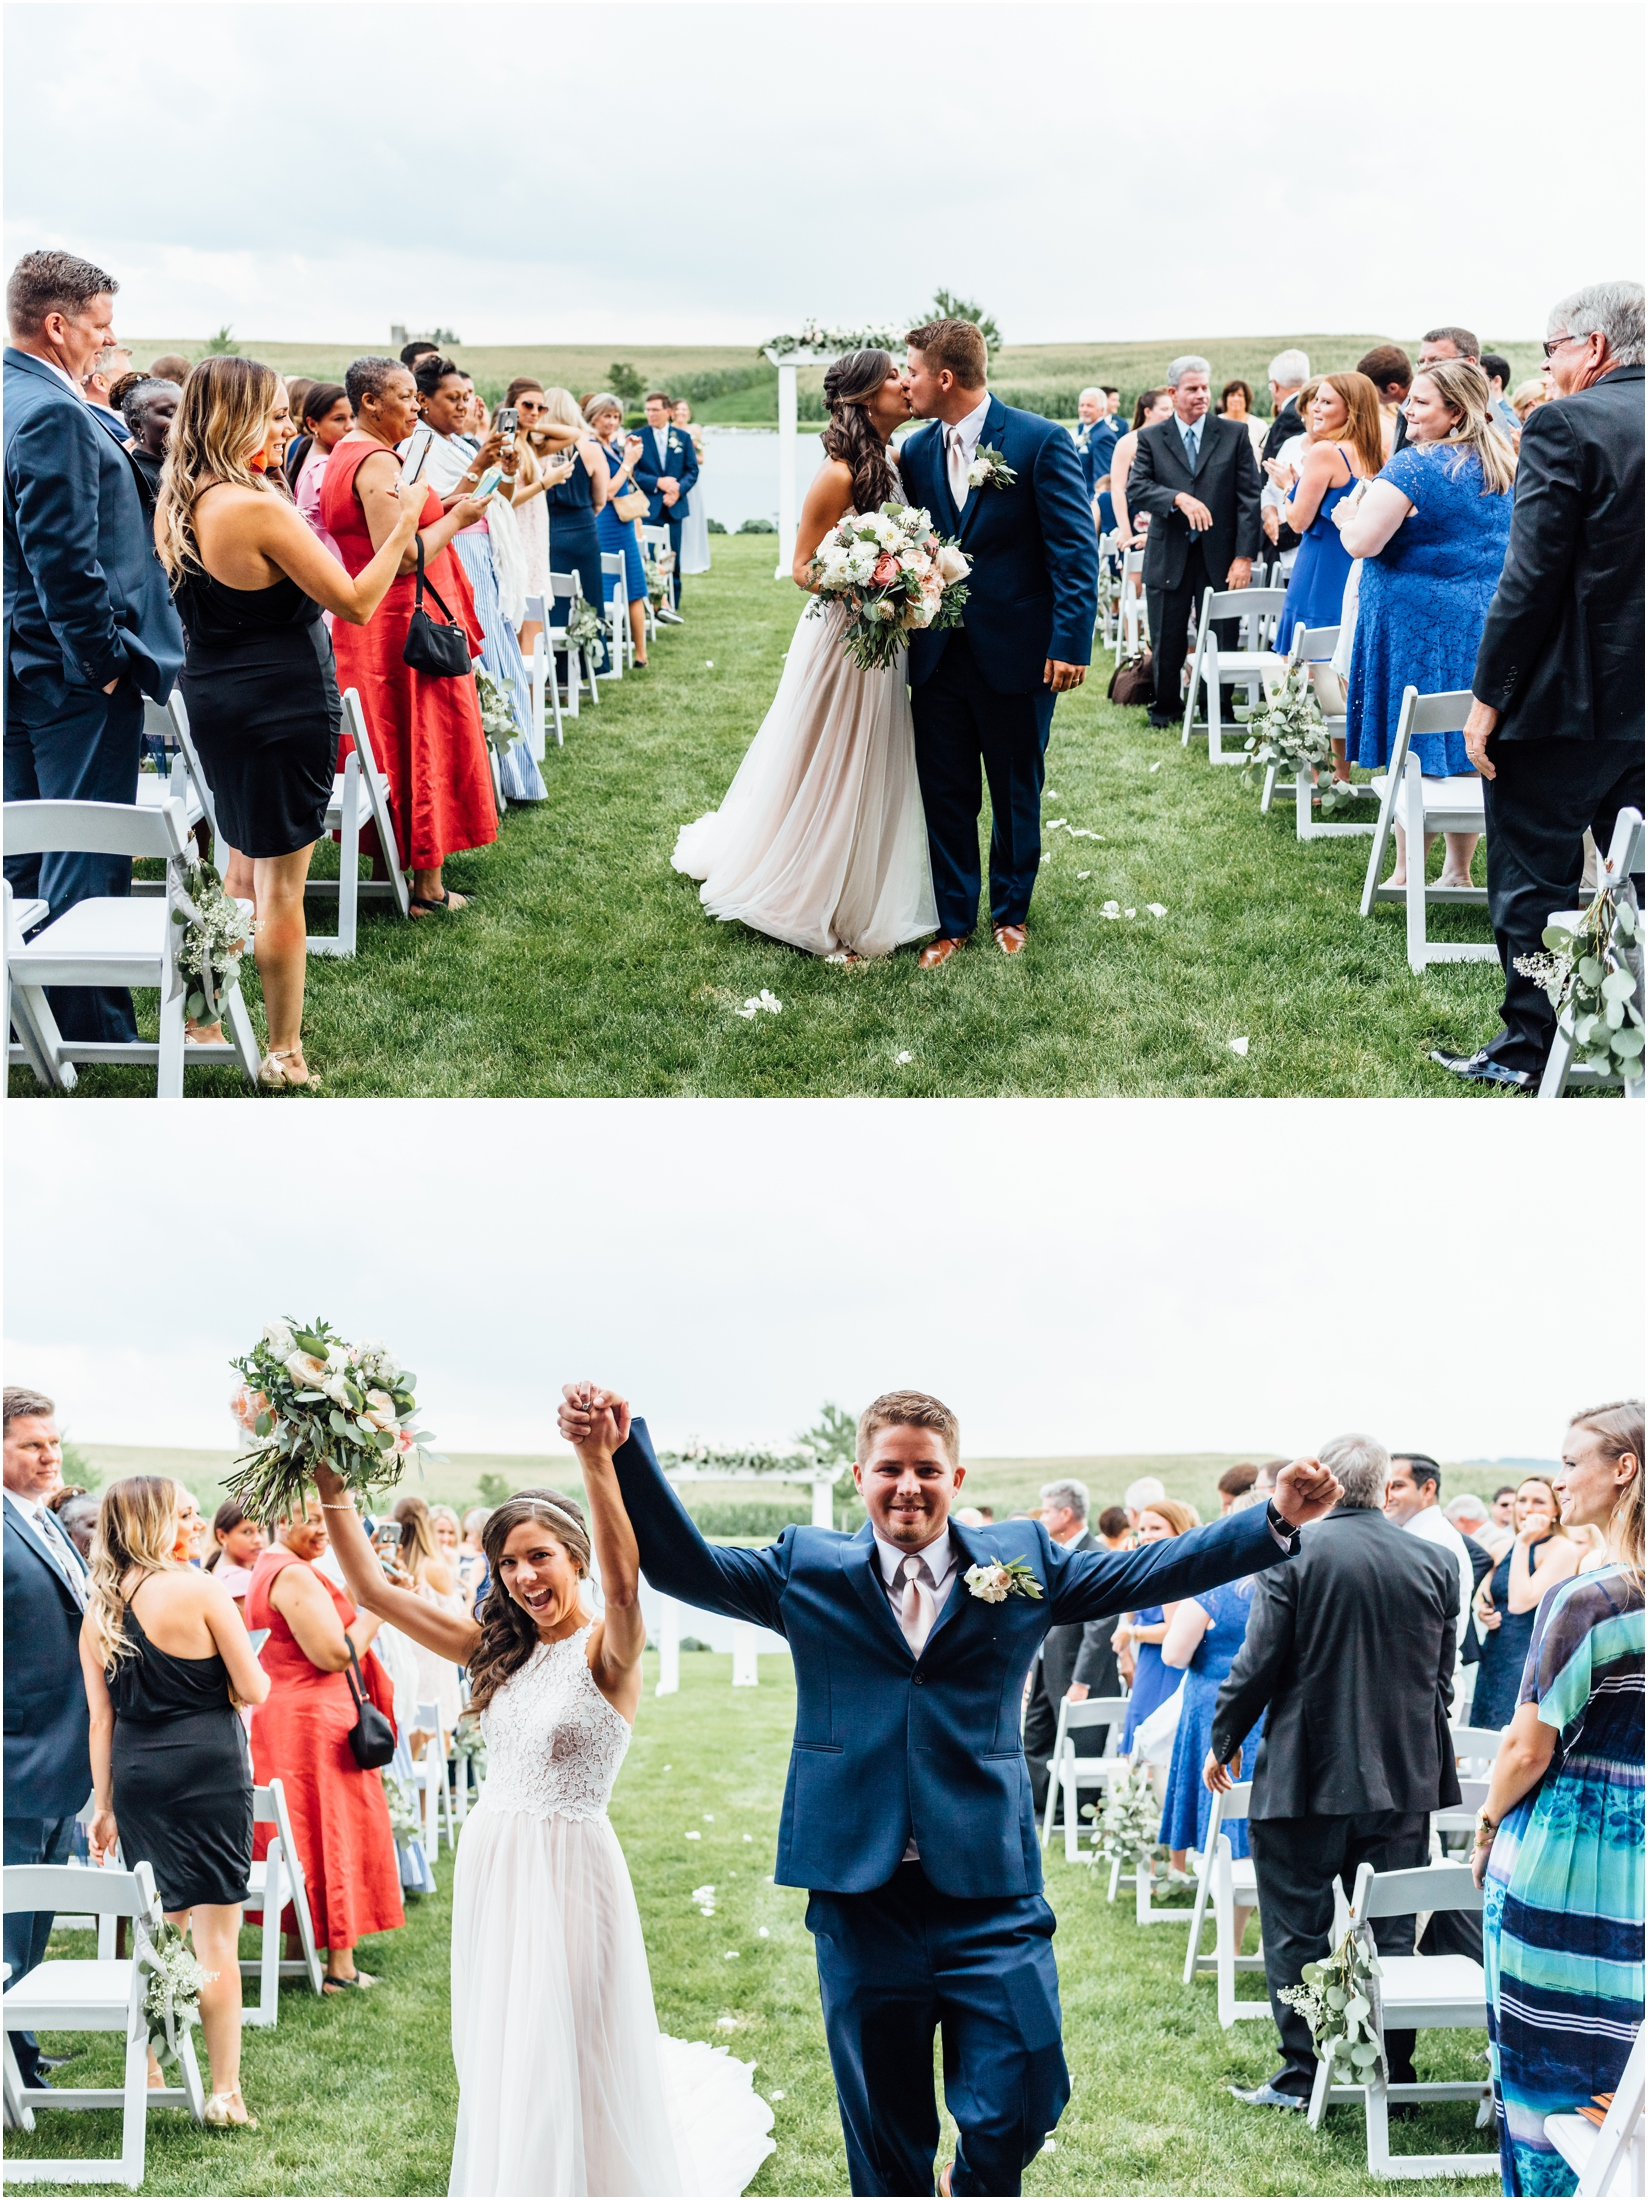 Steph&Bryan_Lancaster_wedding_farm_0520.jpg